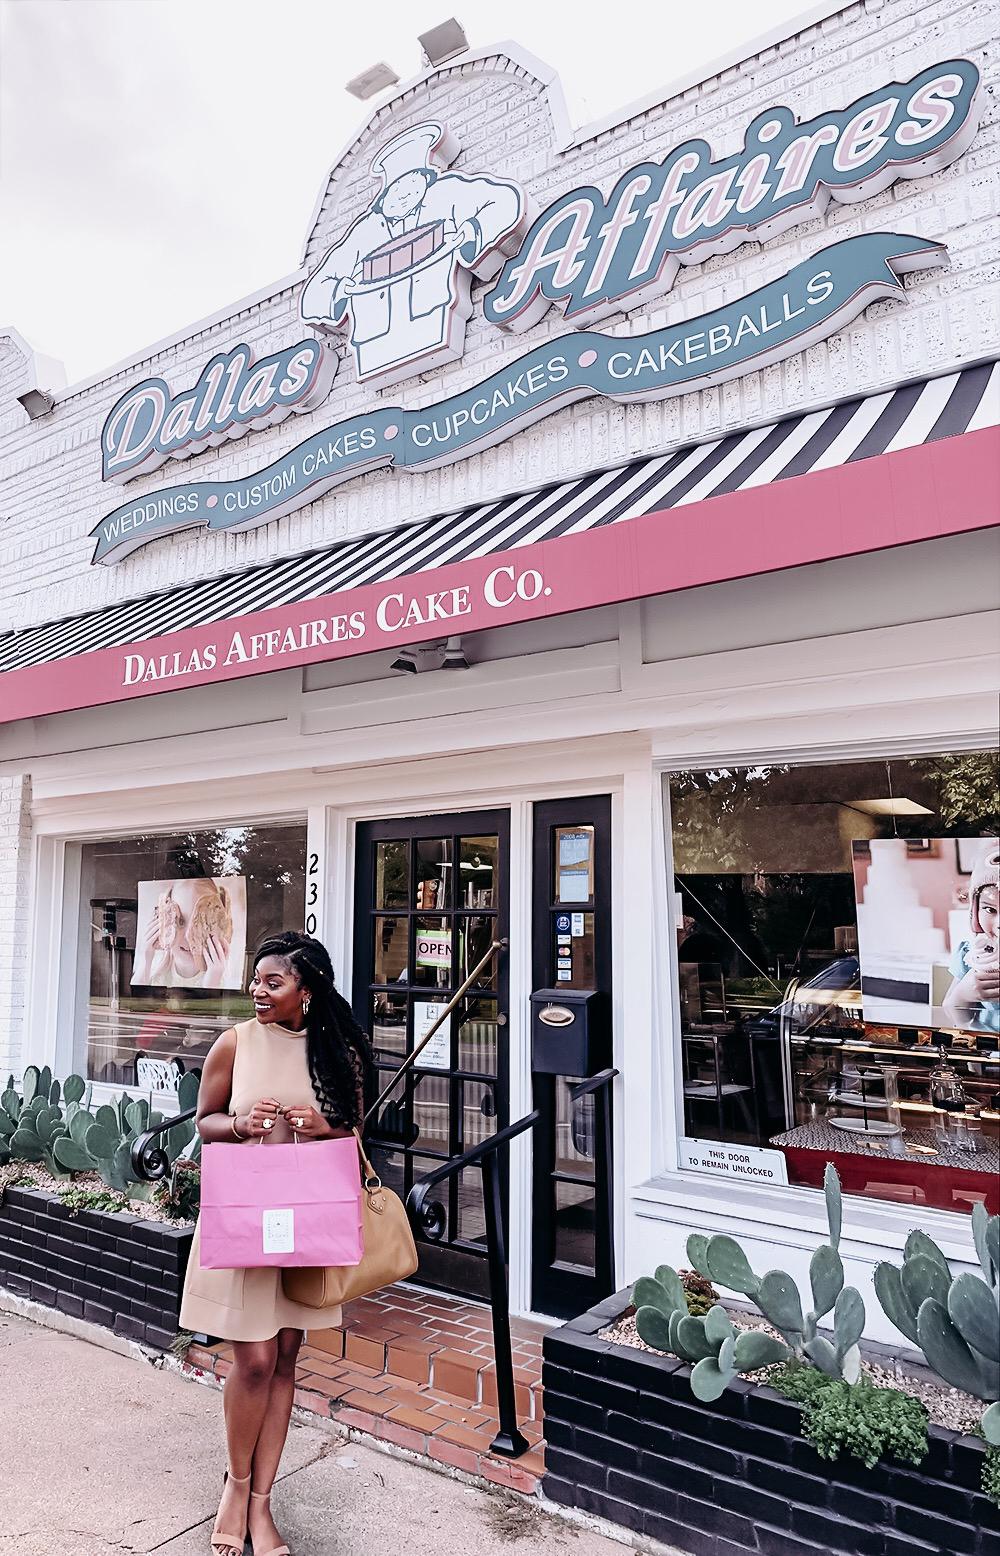 Karis-Renee-Dallas Affaires wedding-cake